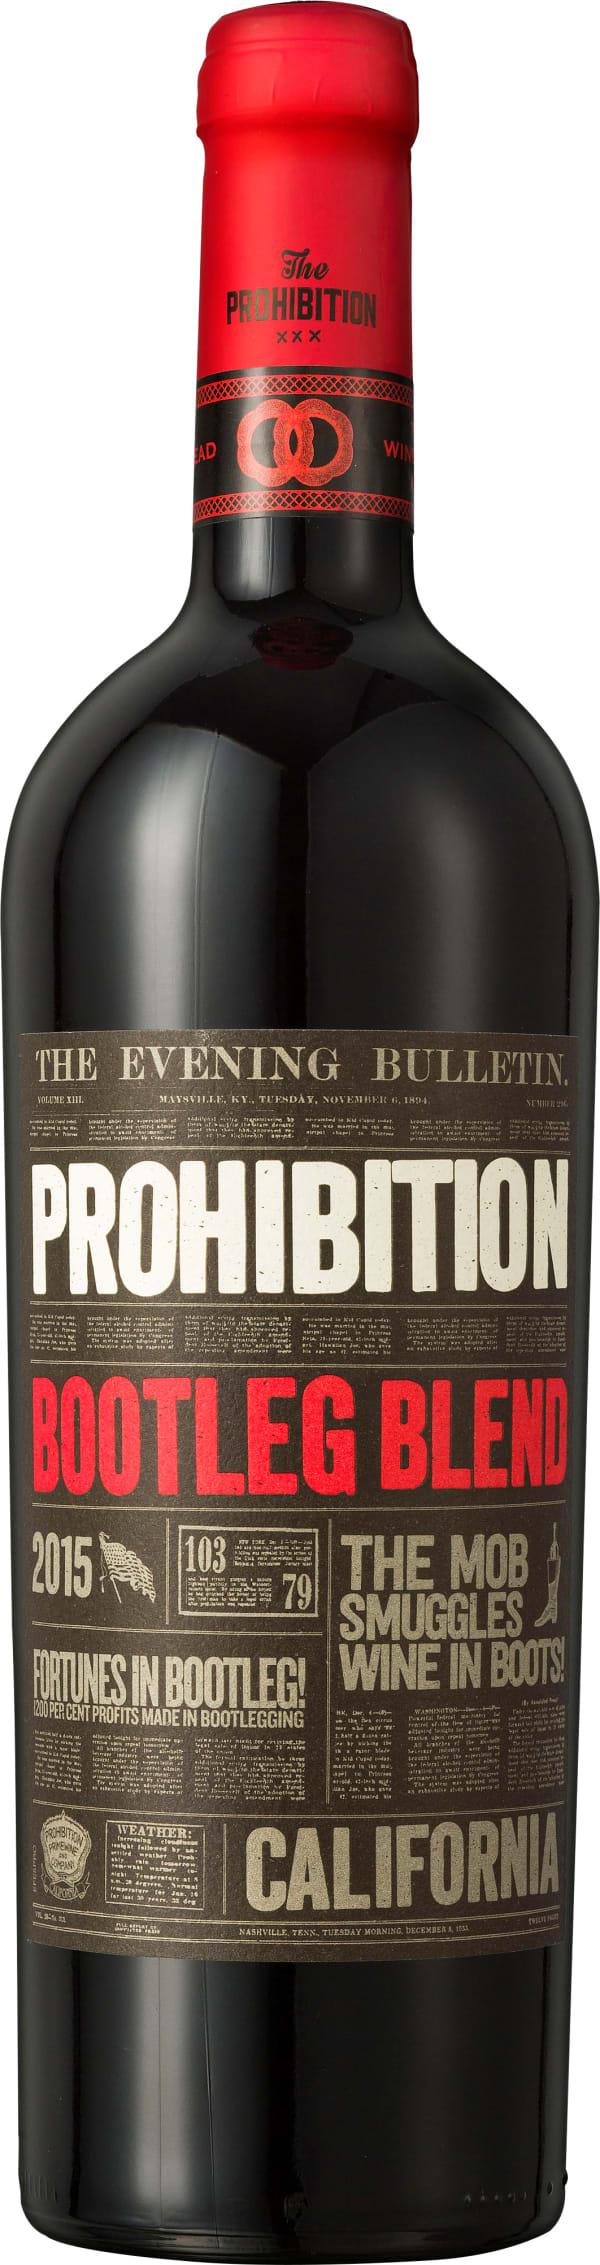 Prohibition Bootleg Blend 2015